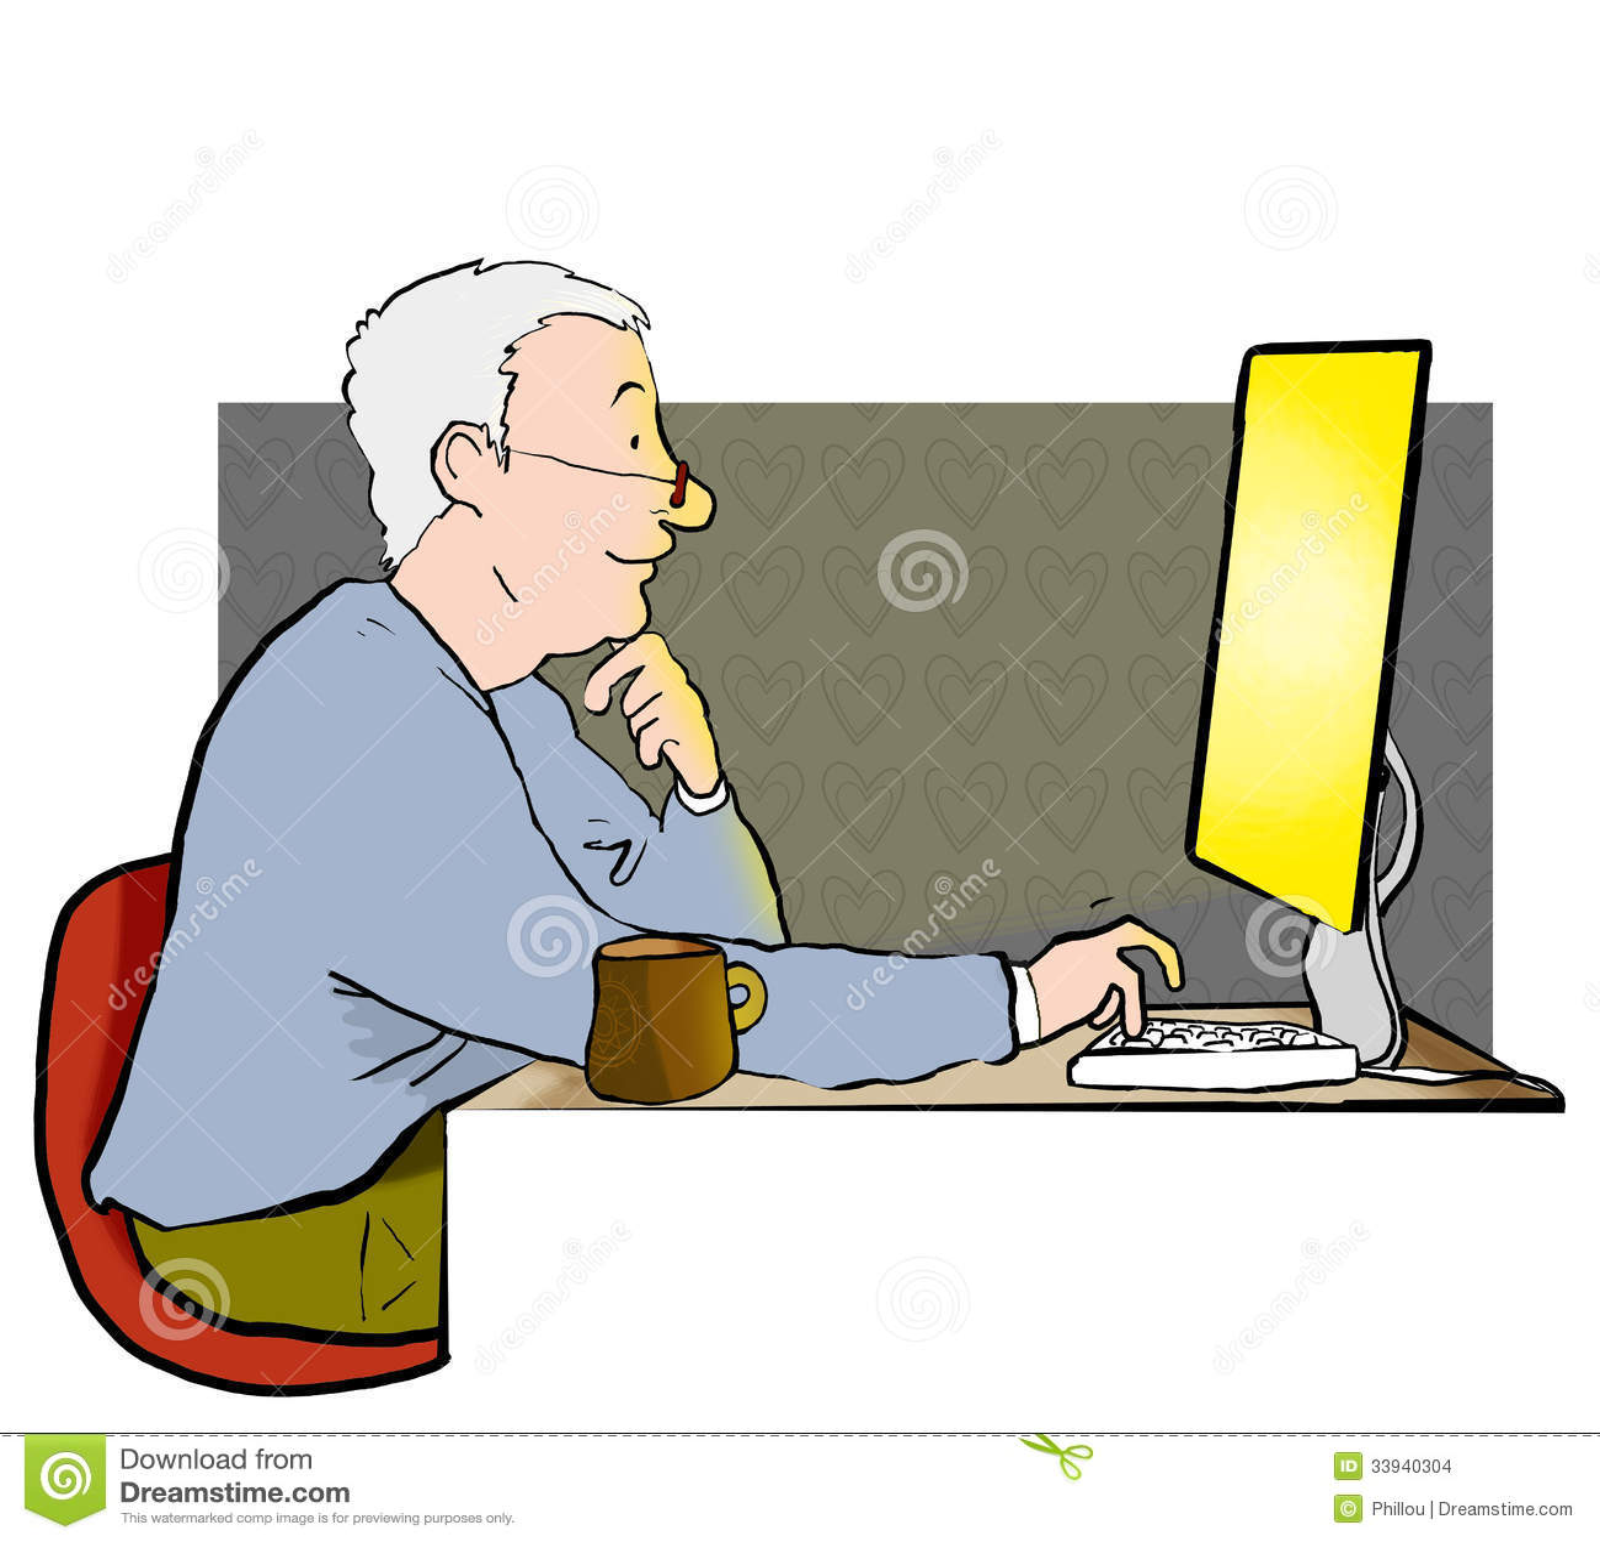 Man on internet